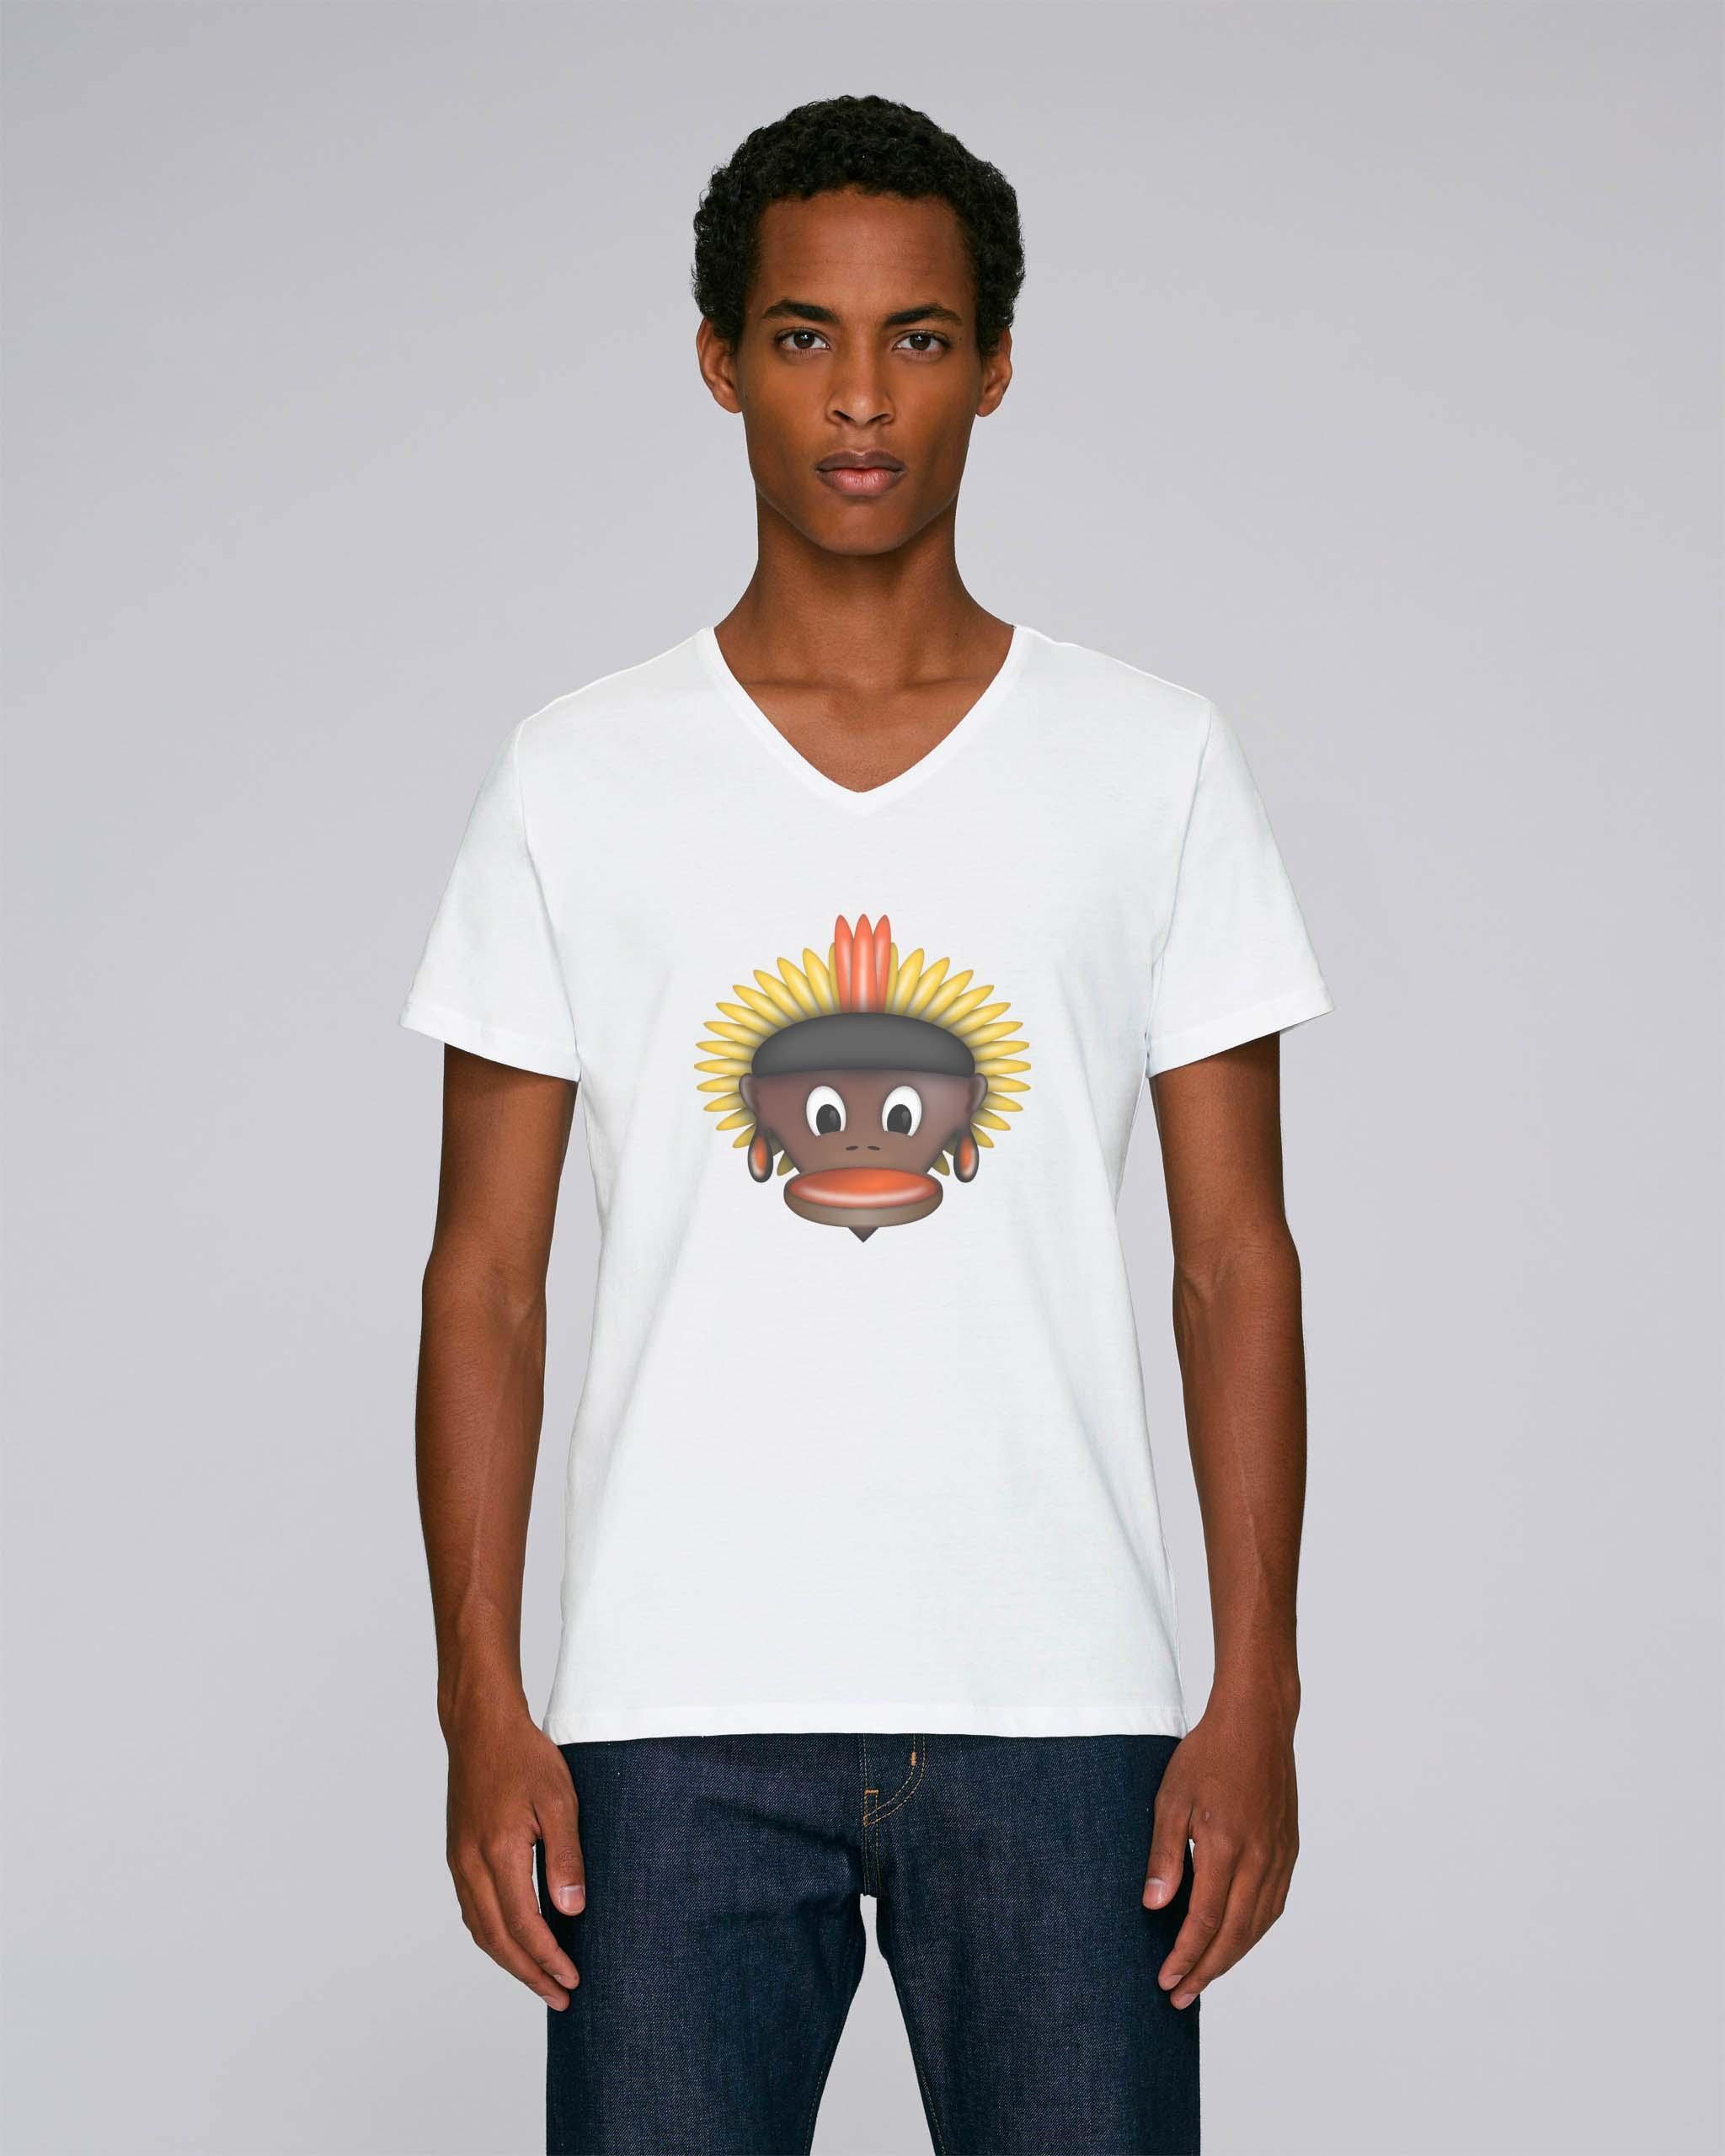 T-Shirt Blanc Bio Homme - Tribe tee